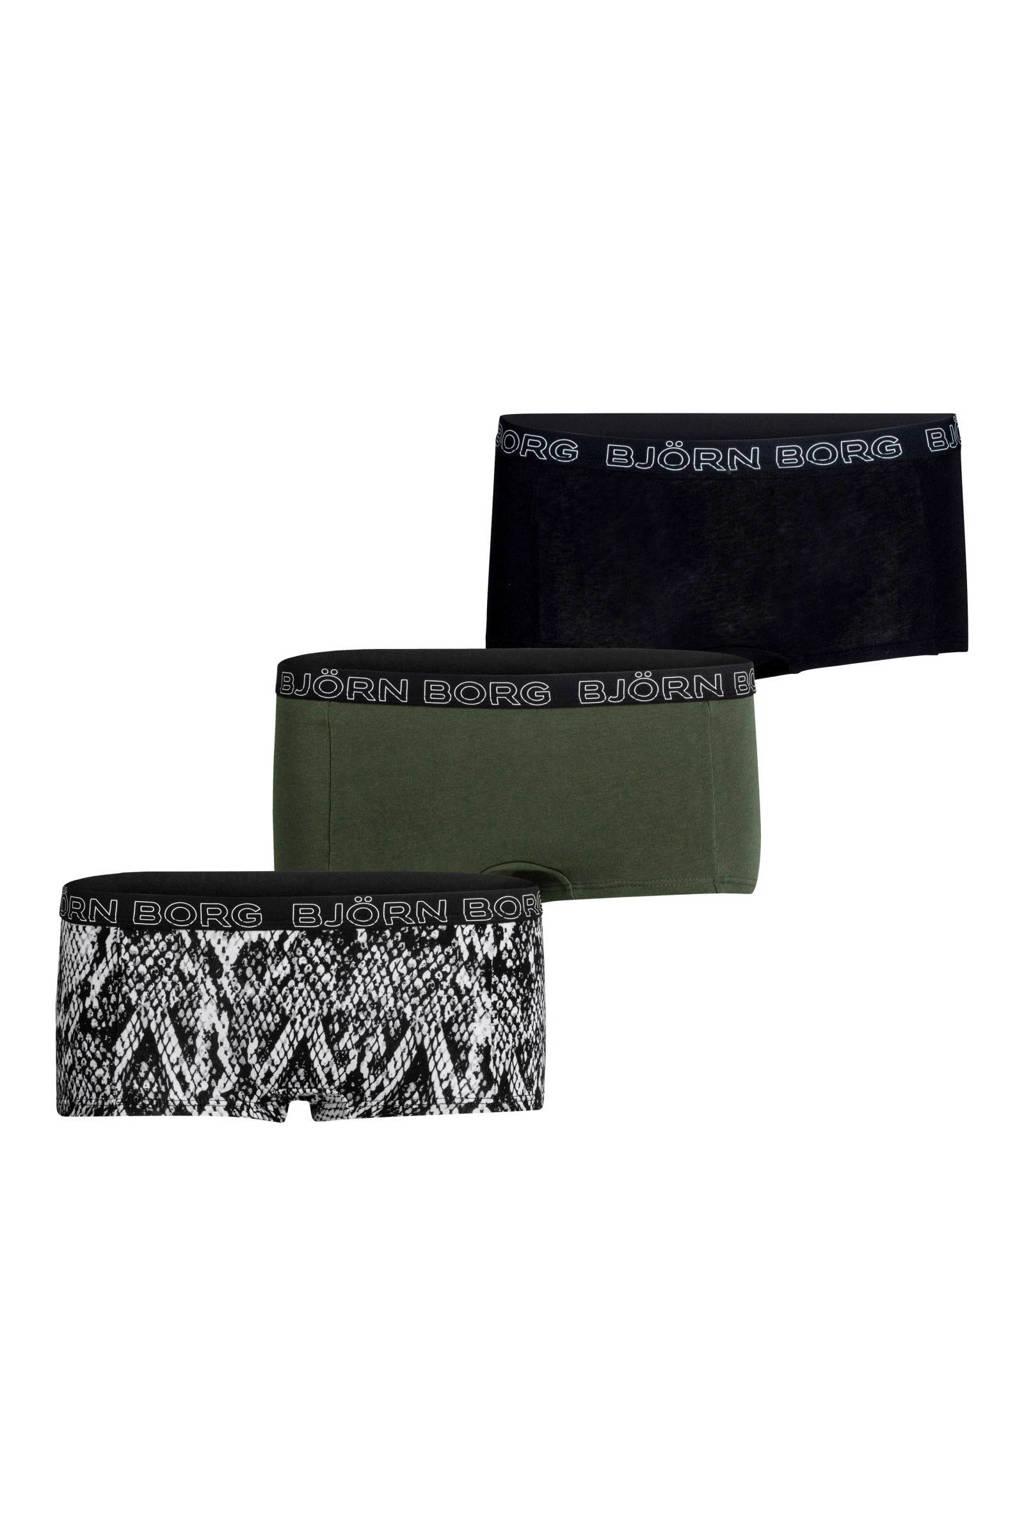 Björn Borg short (set van 3), Groen/zwart/wit